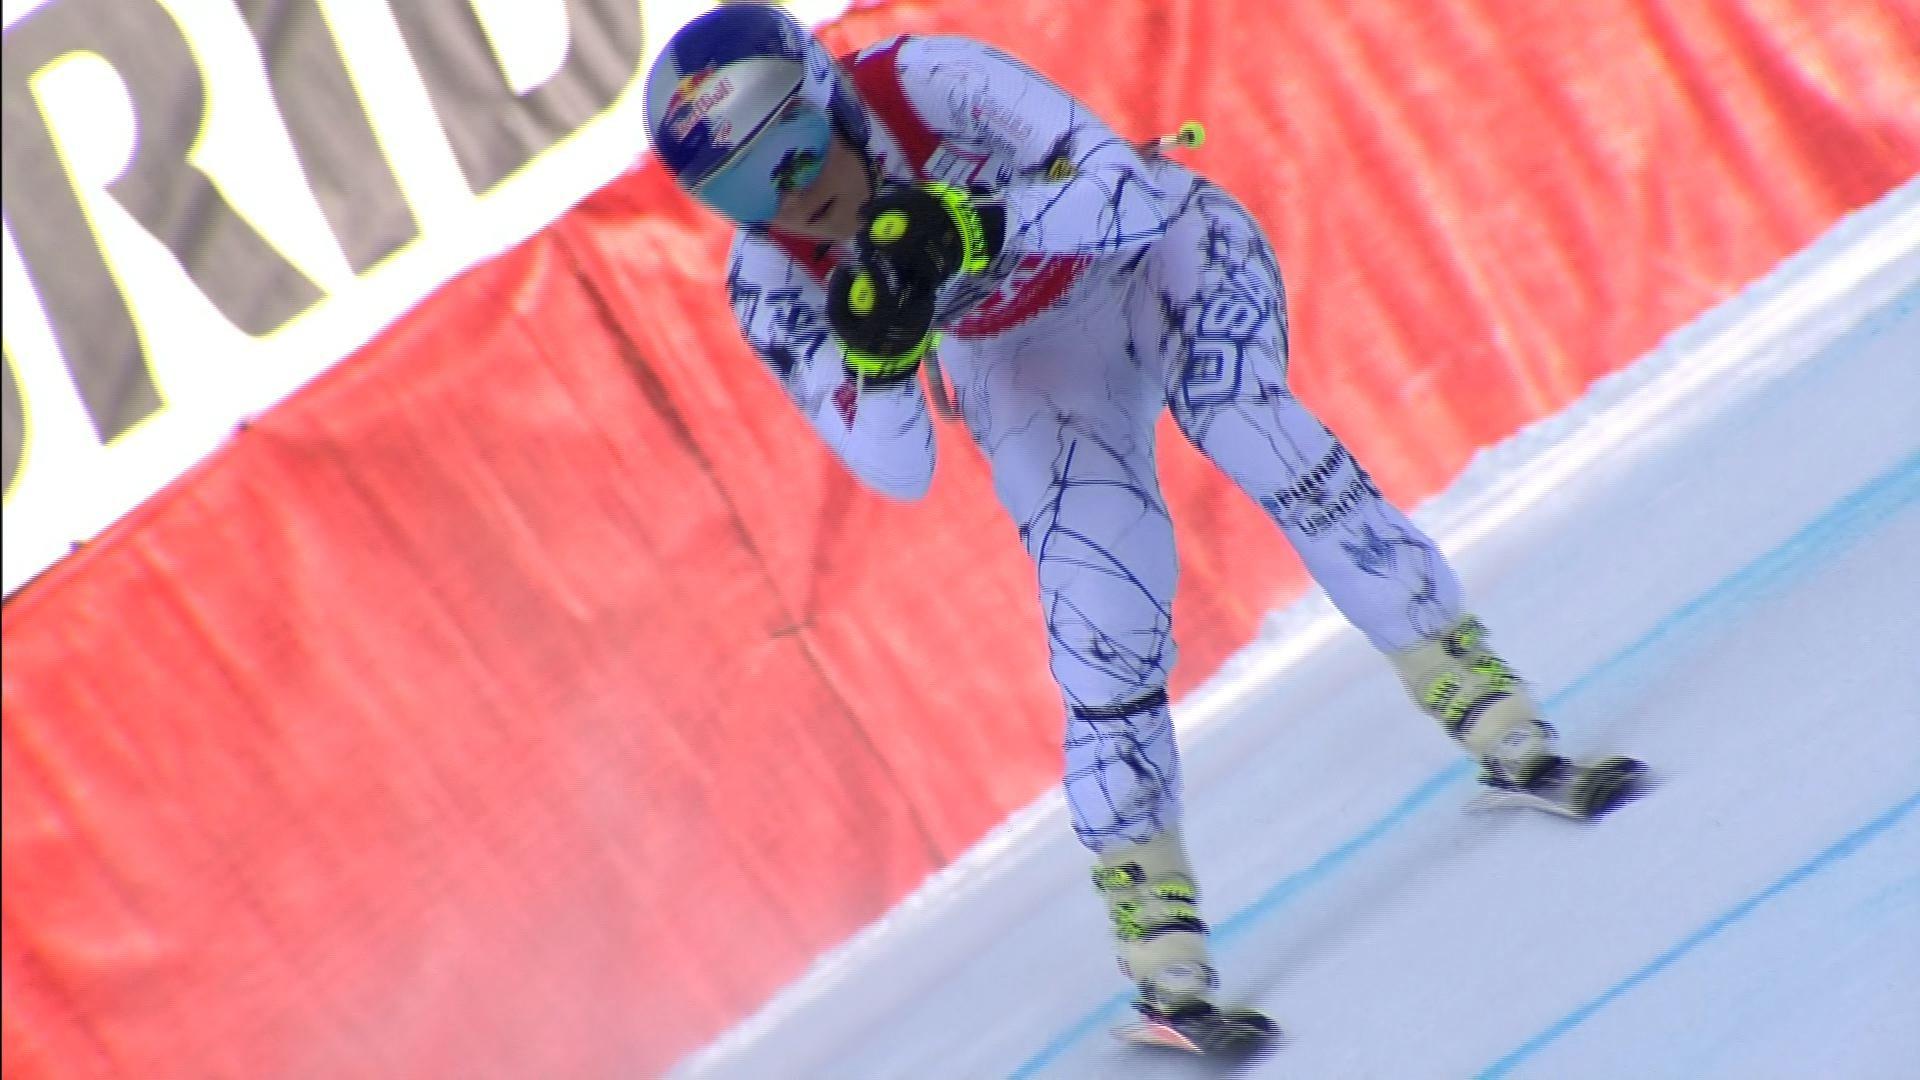 Four-time World Champion Lindsey Vonn